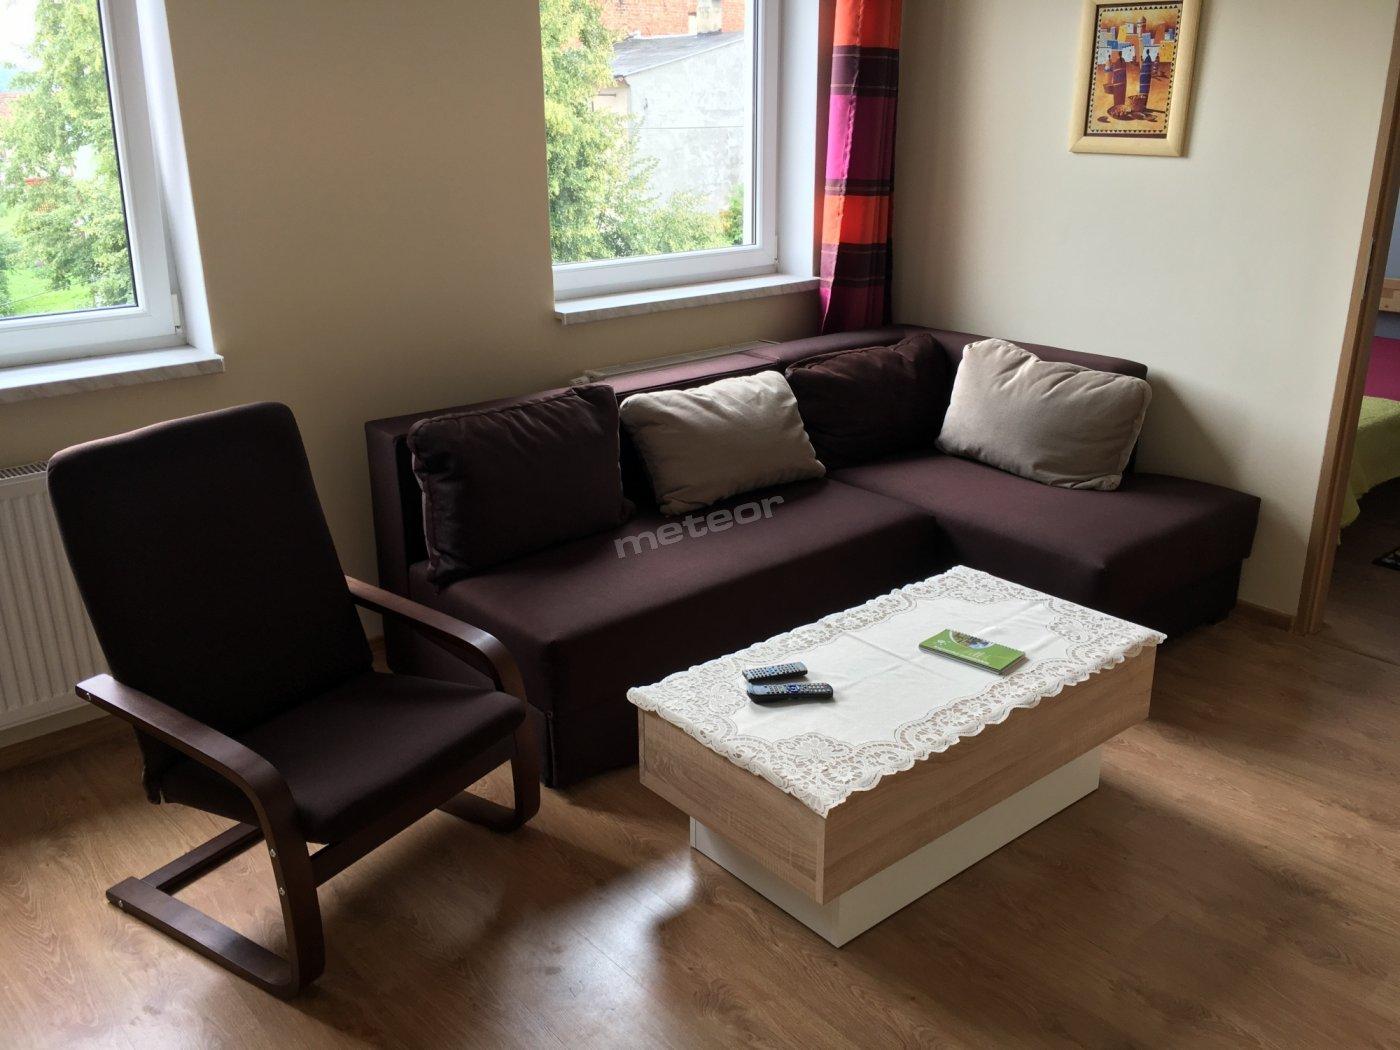 Apartament Borowiacki